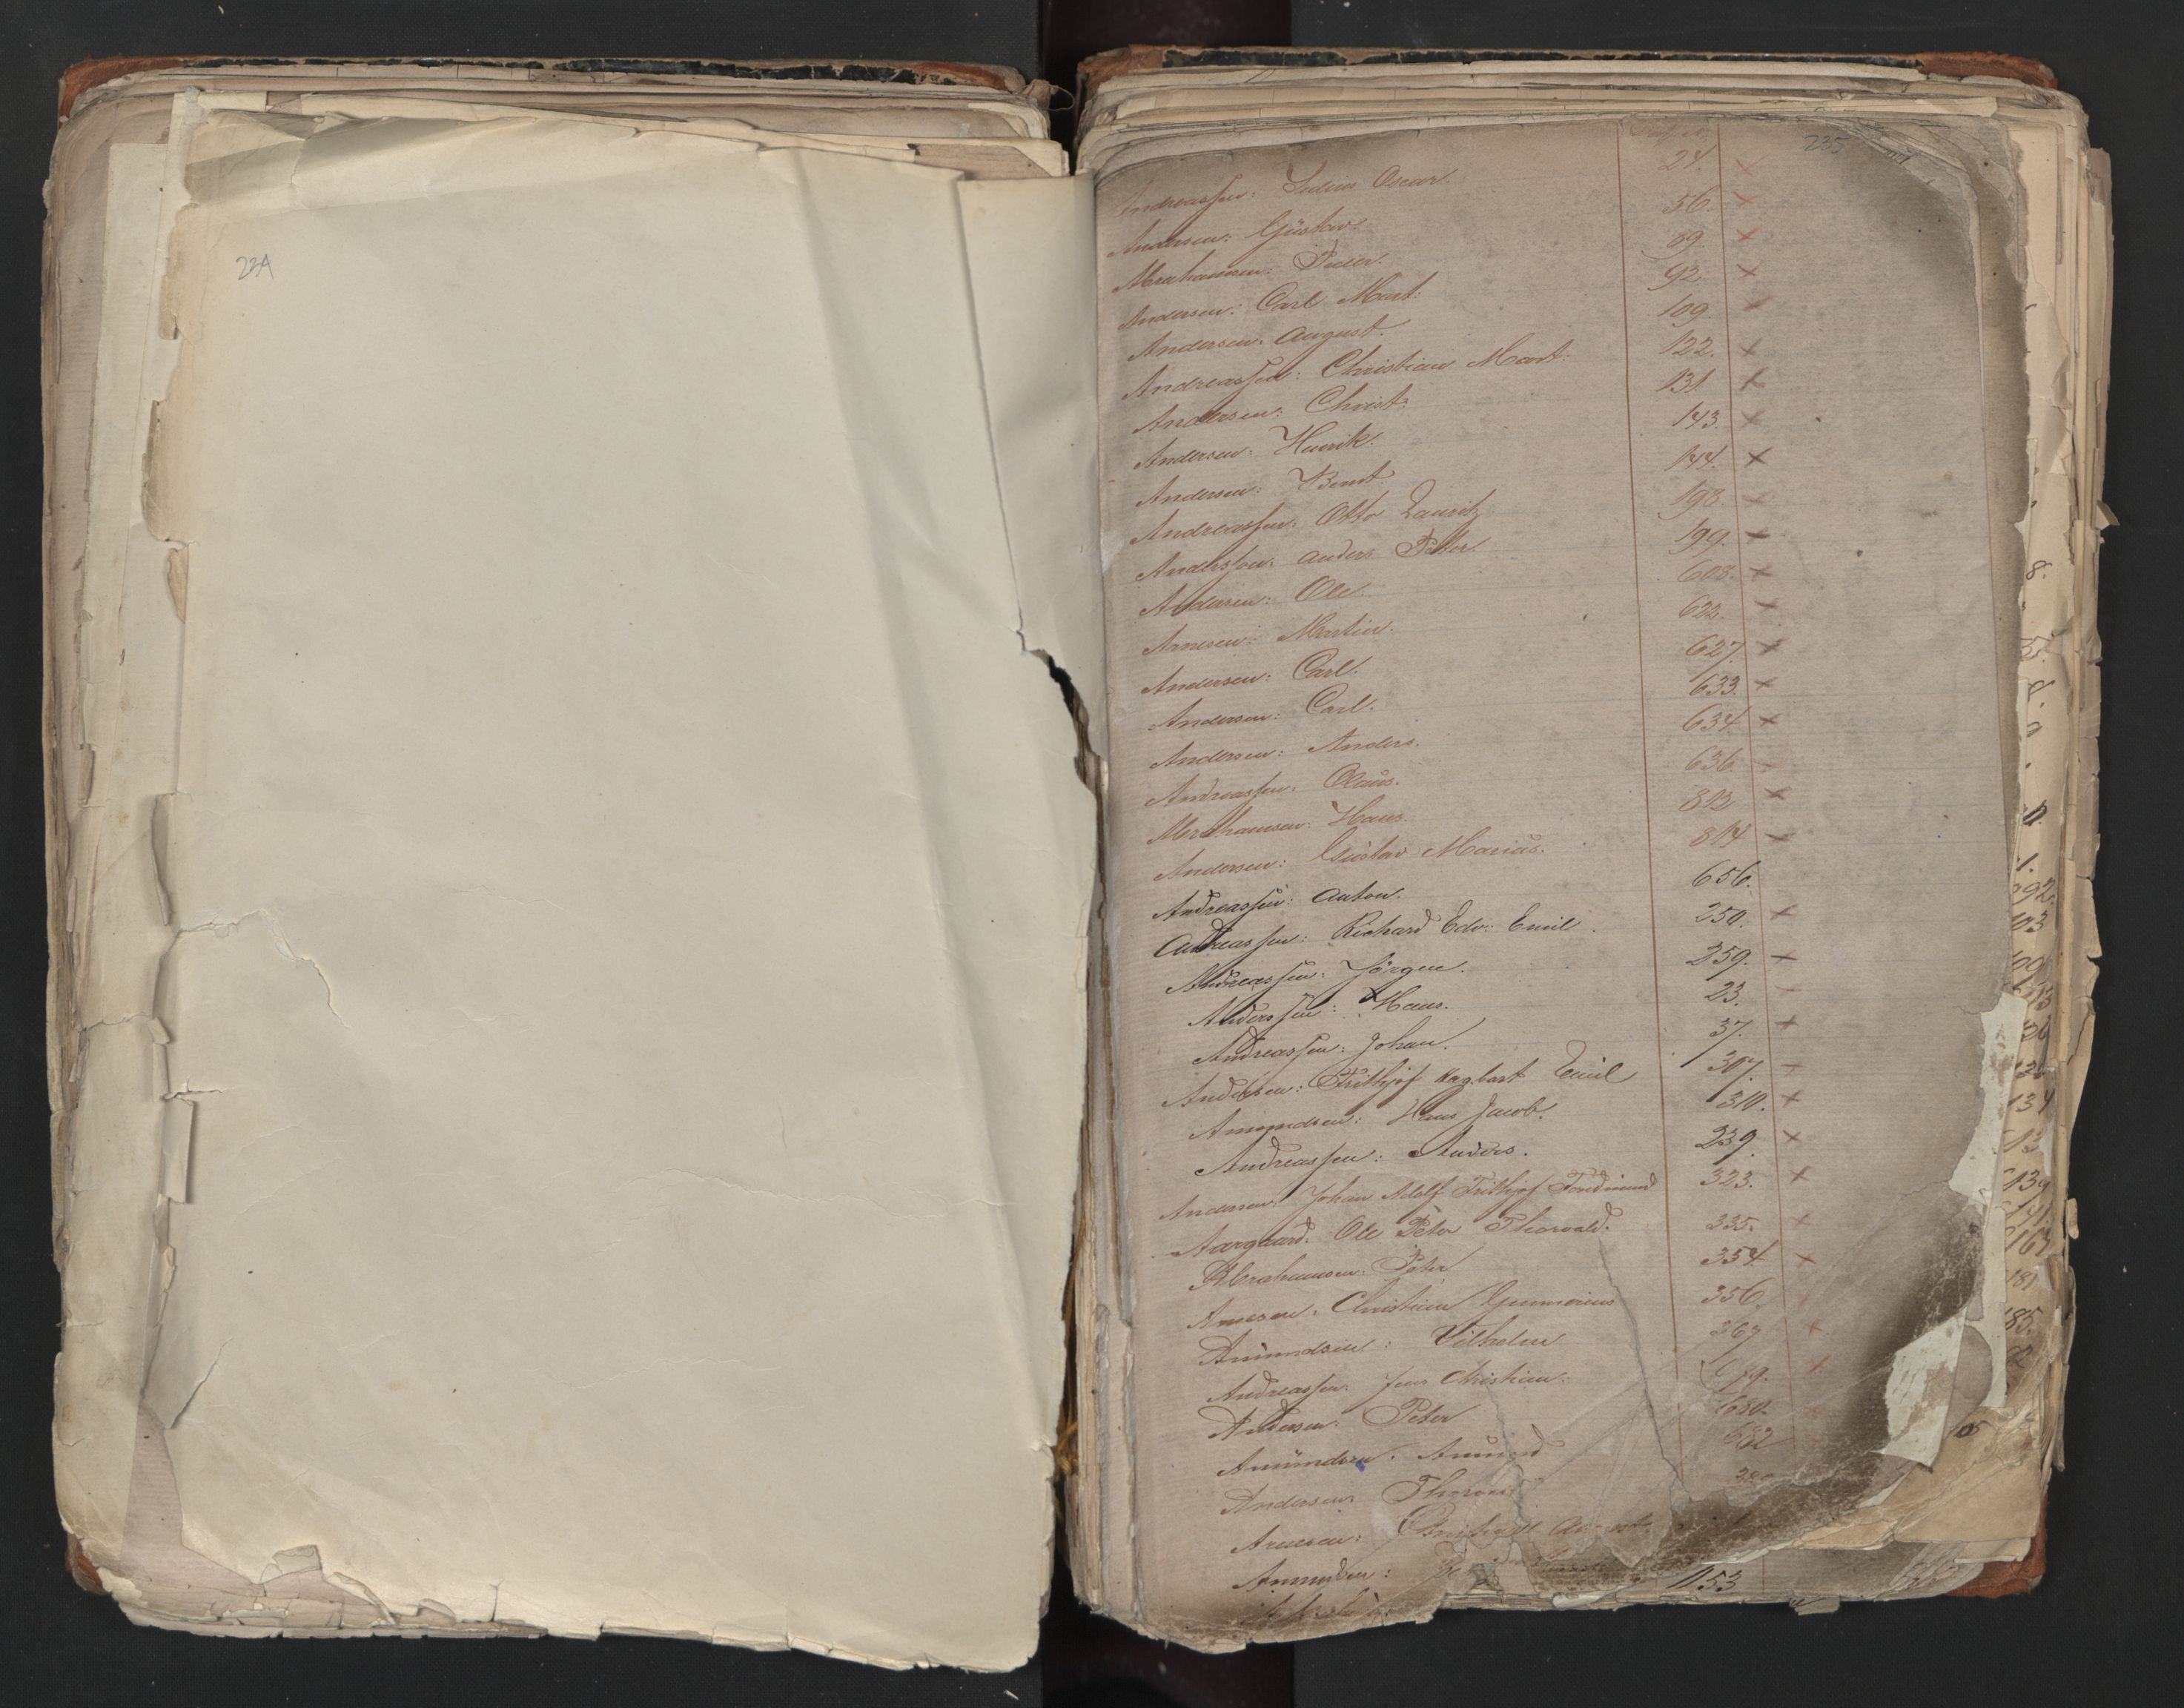 SAO, Oslo sjømannskontor, F/Fa/L0001: Register for Kristiania krets, 1866-1891, s. 234-235